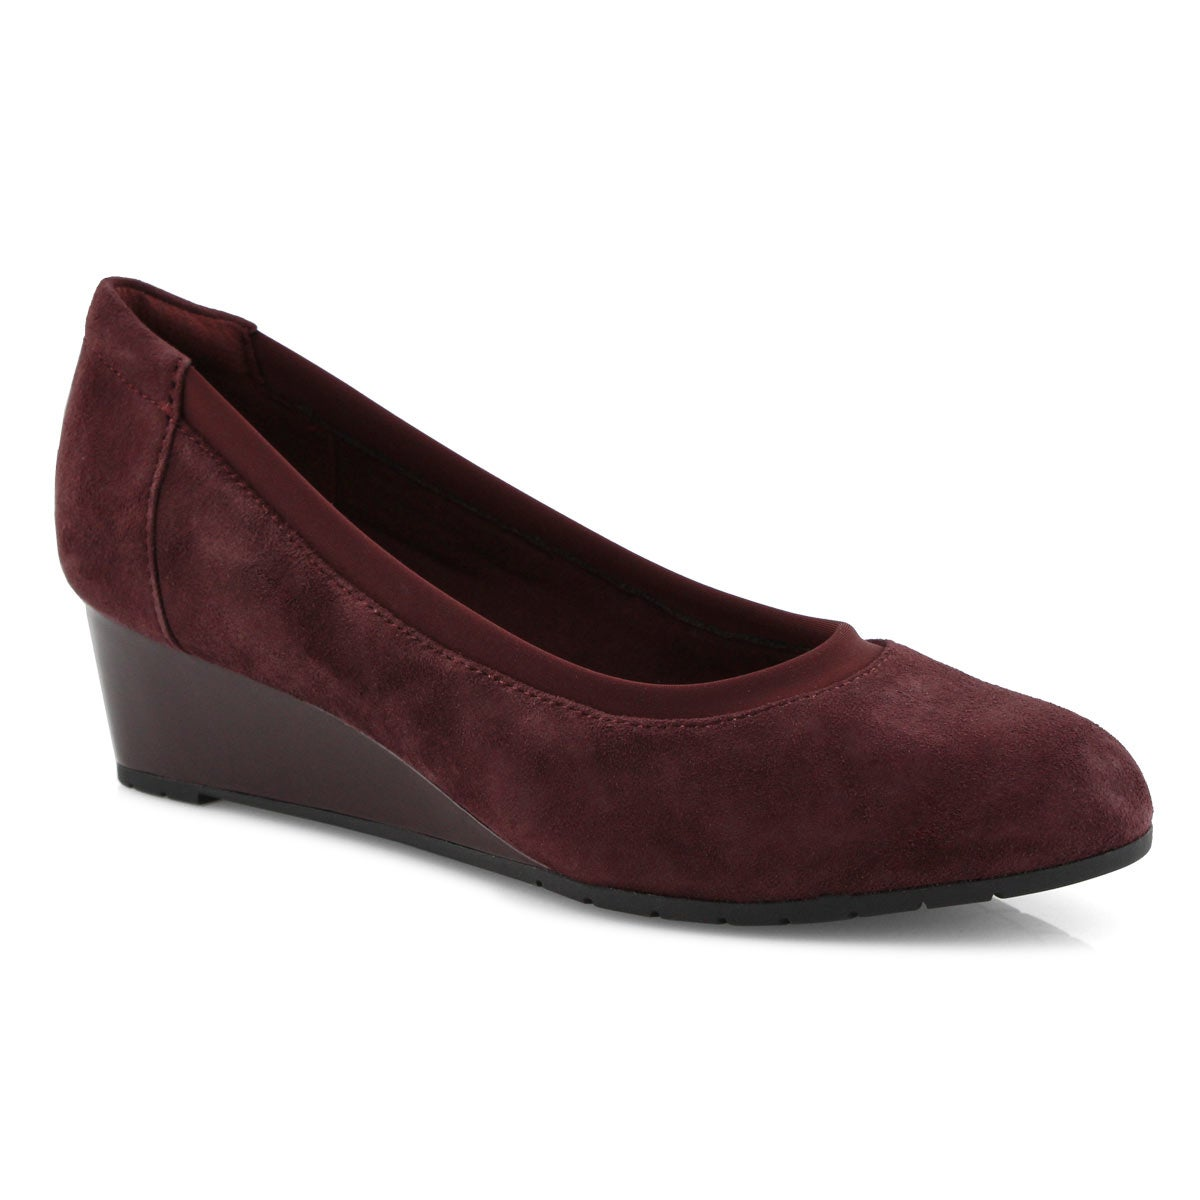 Lds Mallory Berry burgundy dress wedge